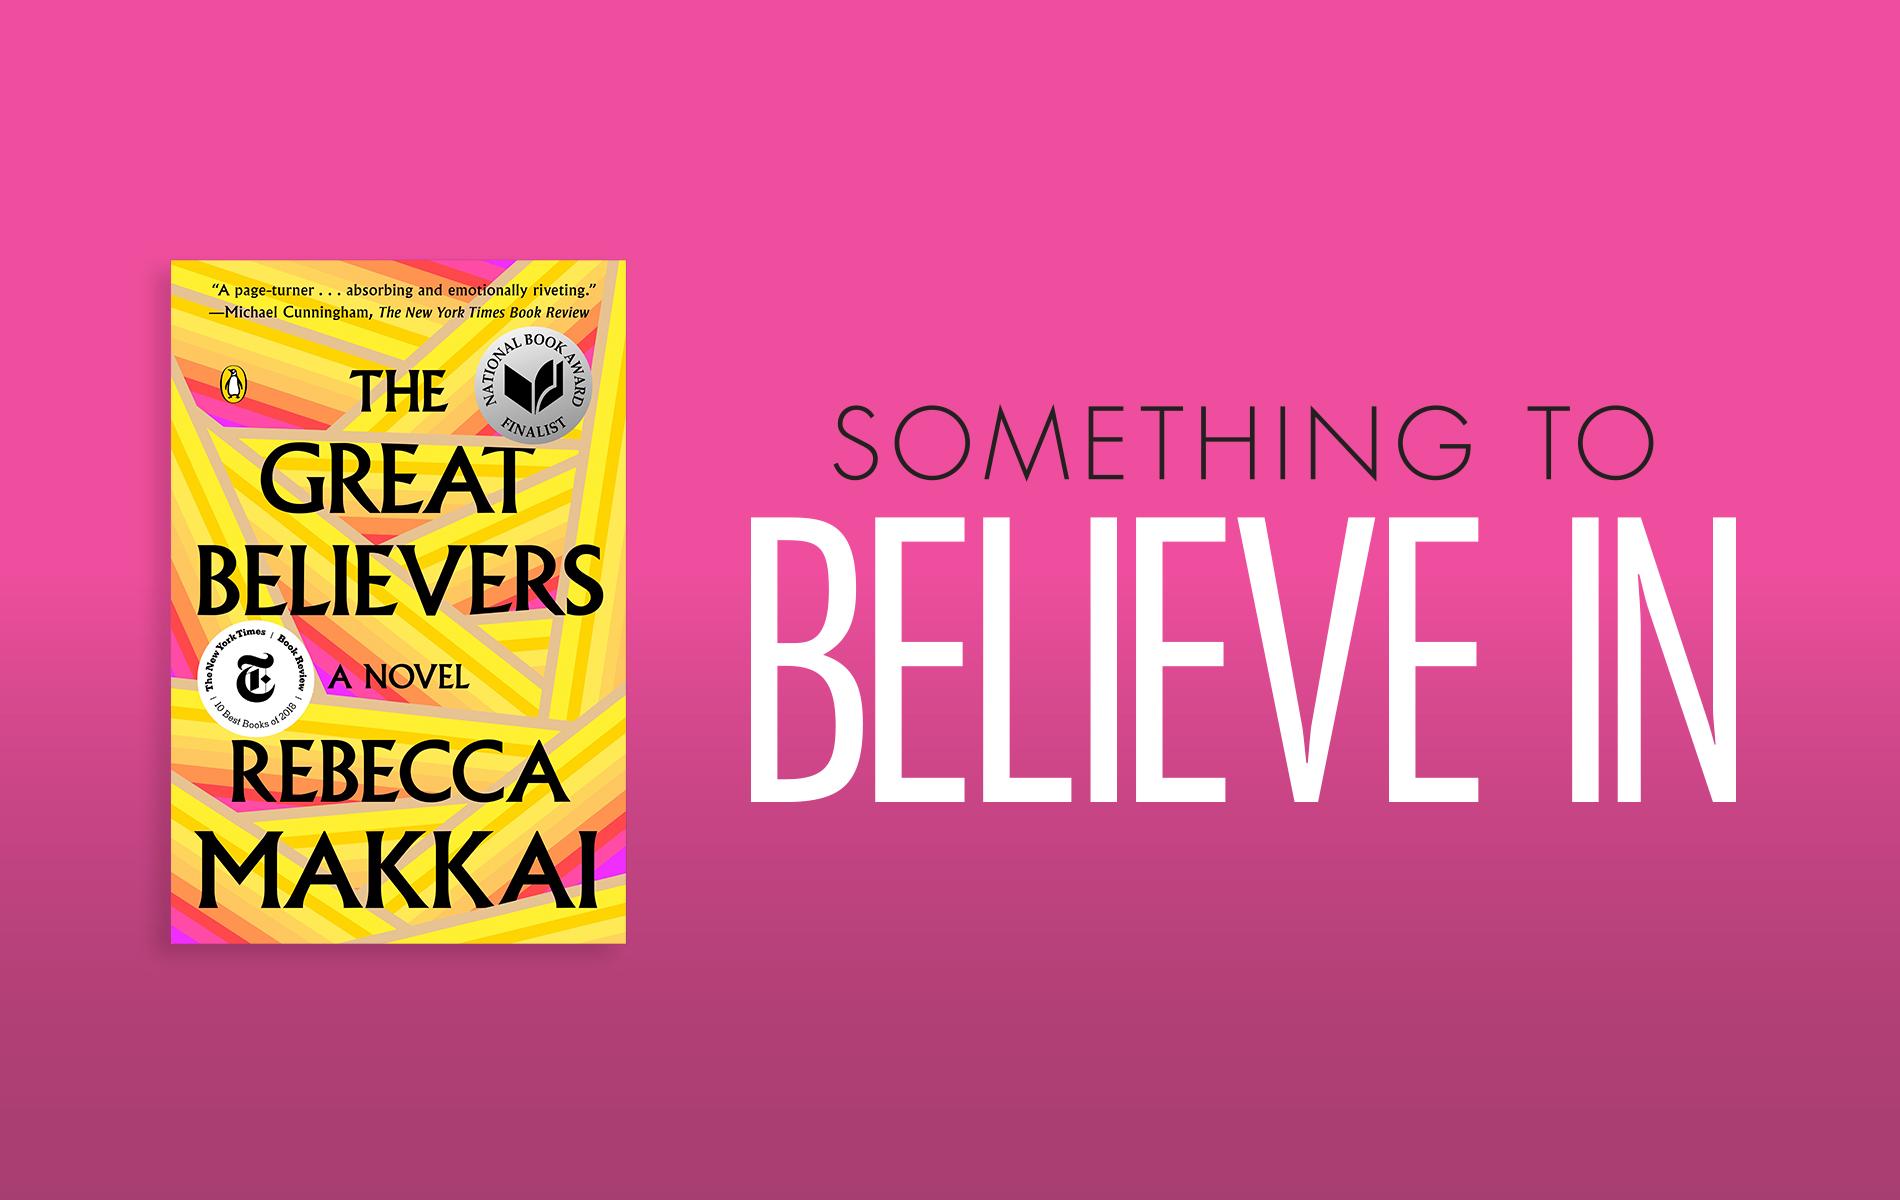 VIE Book Club The Readers Corner, The Great Believers by Rebecca Makkai